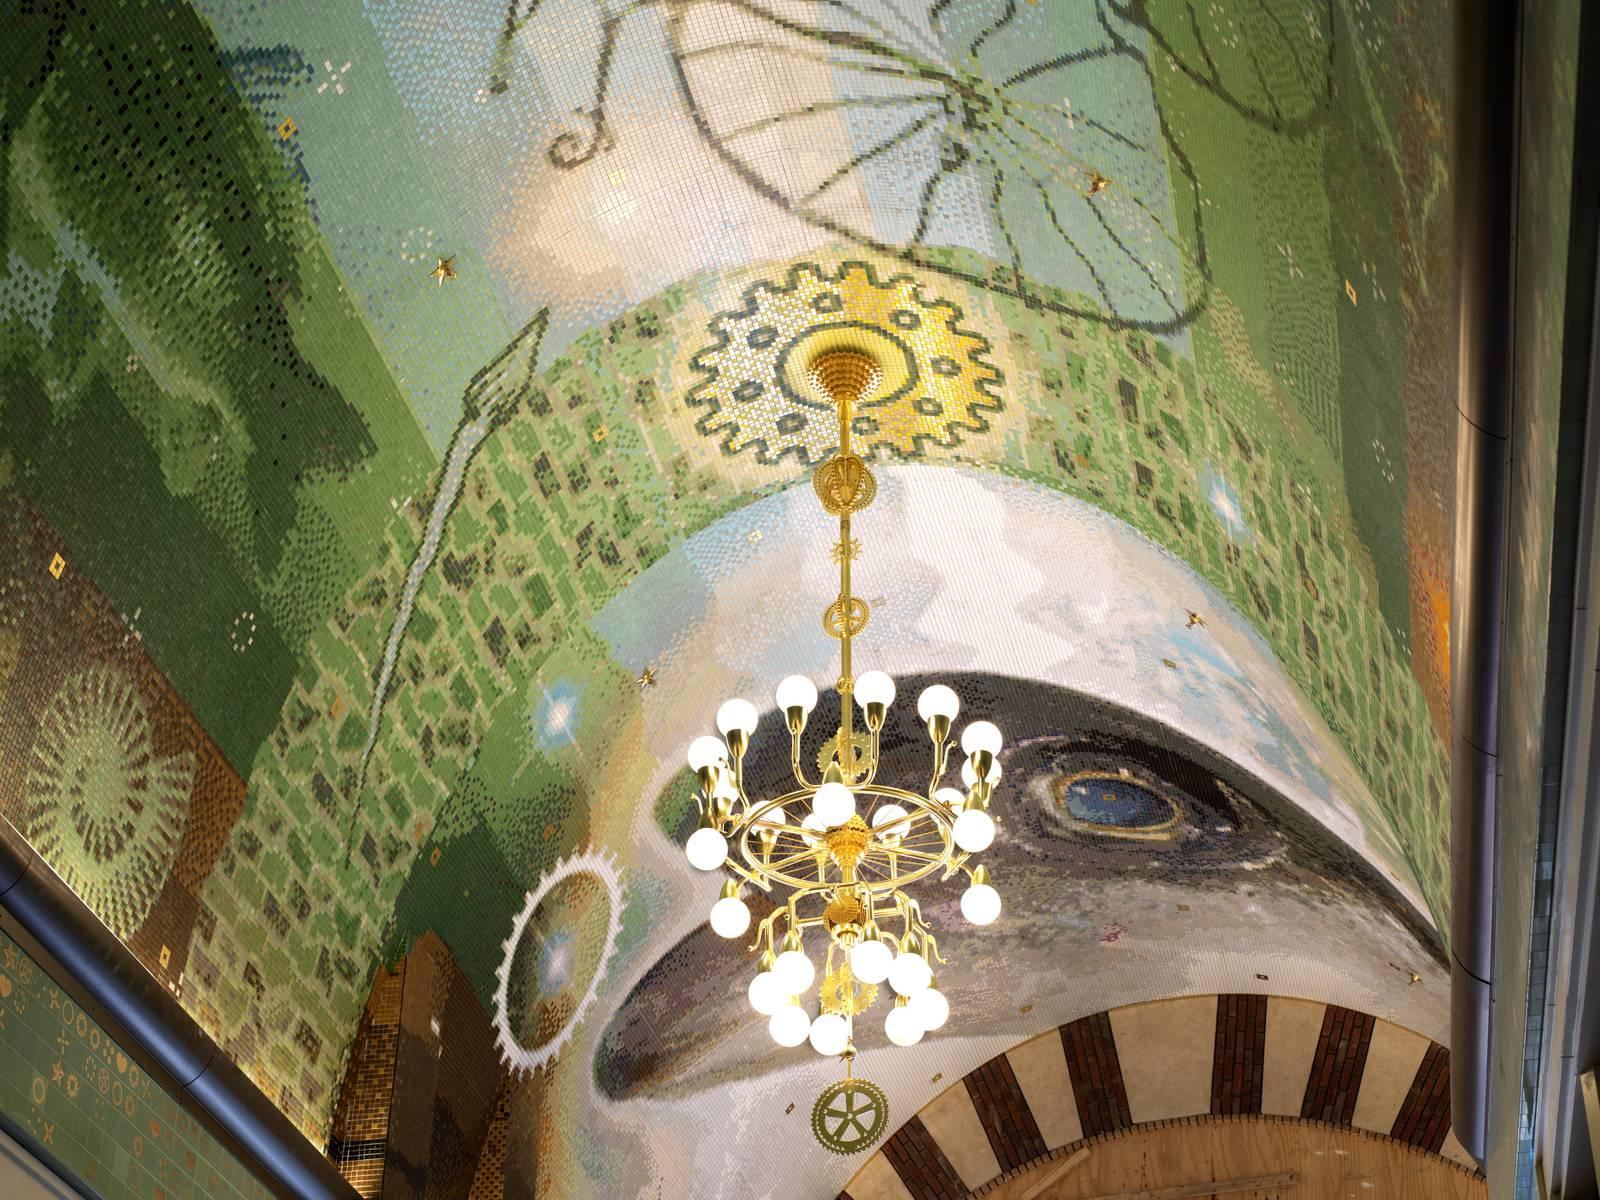 Beurspassage, Damrak, Nieuwendijk Amsterdam mozaïekplafond en kroonluchter